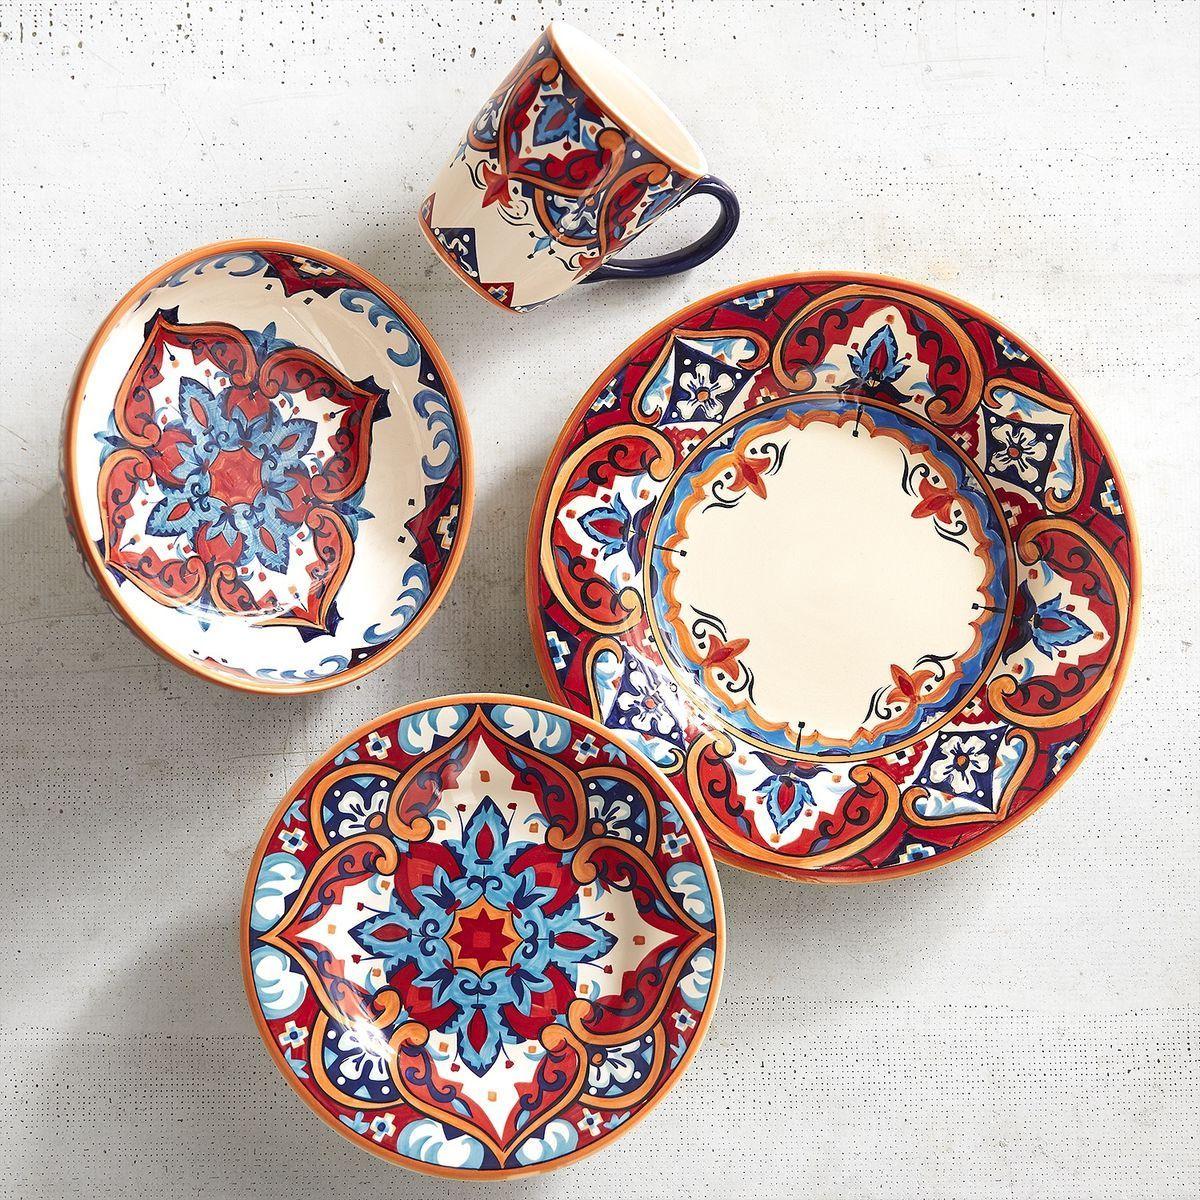 Bohemian Decor Karina Tile Dinnerware  sc 1 st  Pinterest & Bohemian Decor: Karina Tile Dinnerware   Bohemian Decor   Pinterest ...